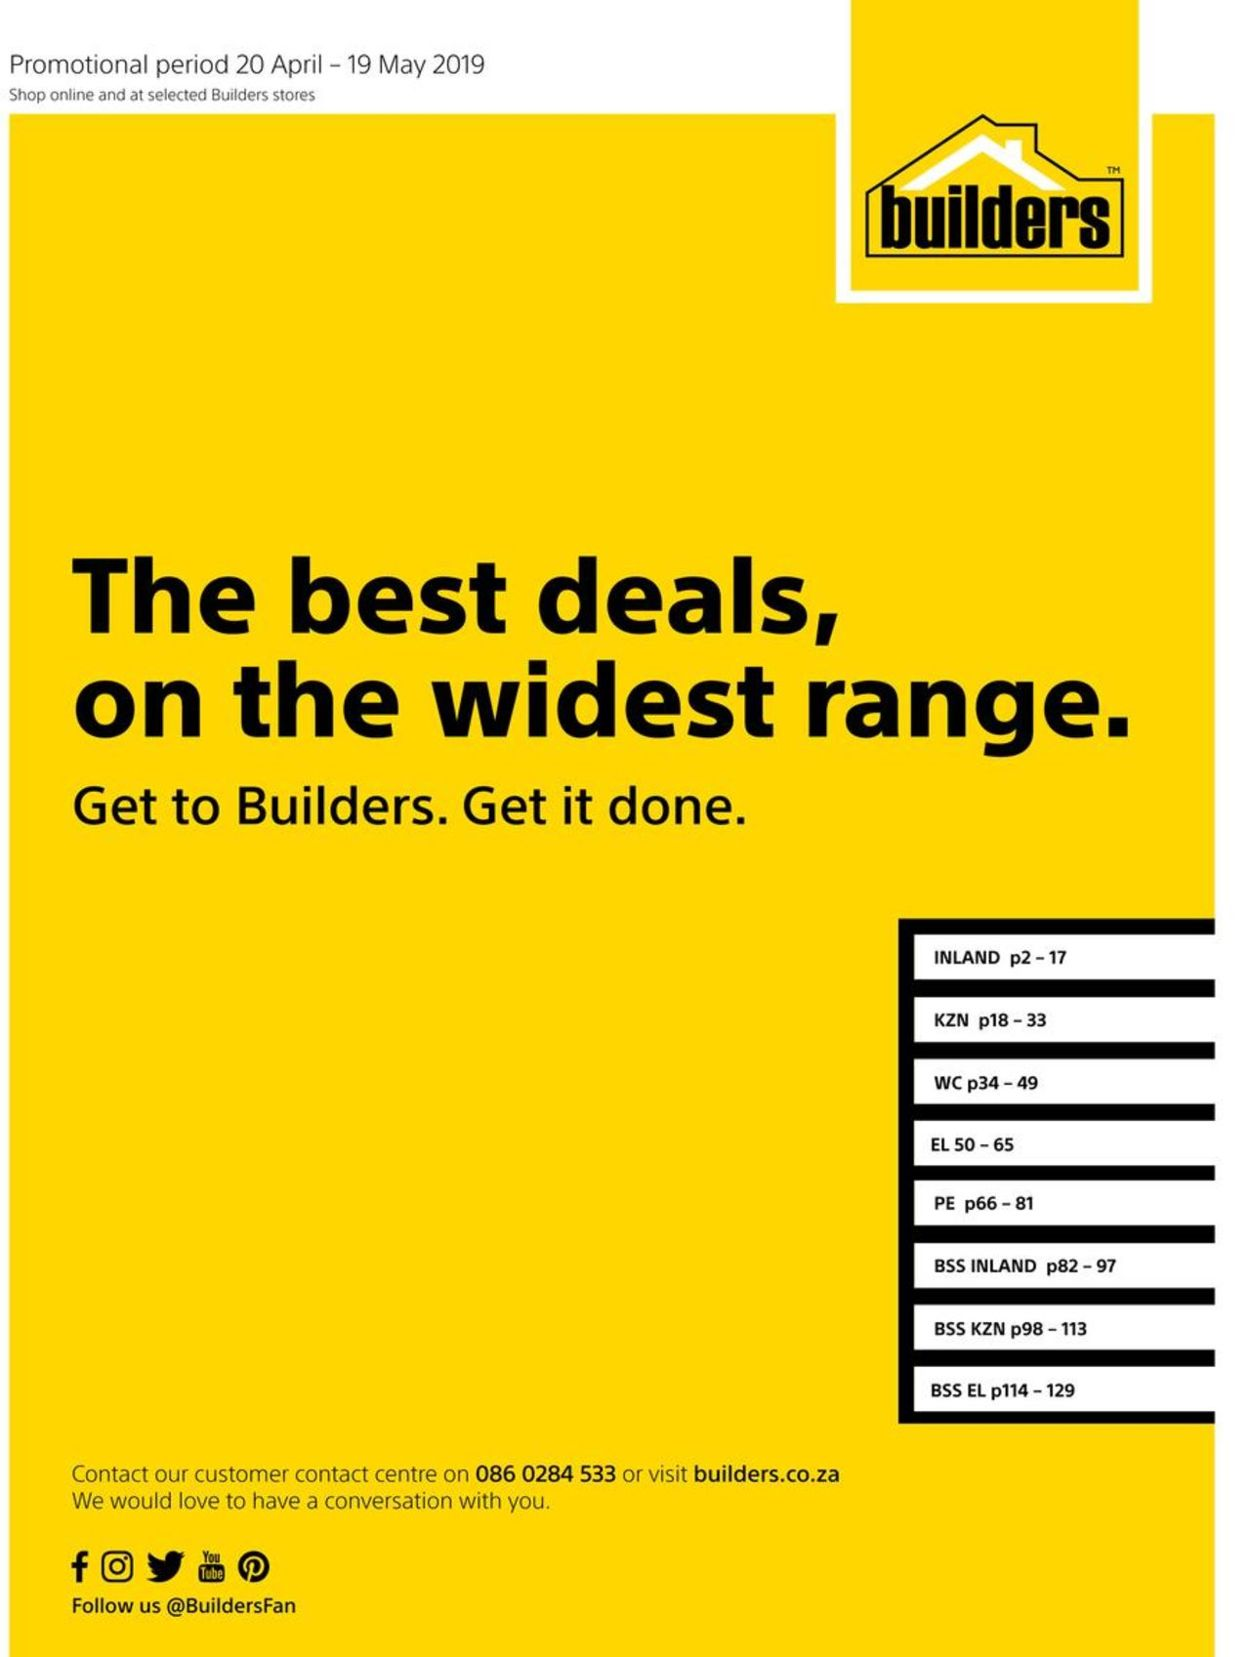 Builders Warehouse Catalogue - 2019/04/20-2019/05/19